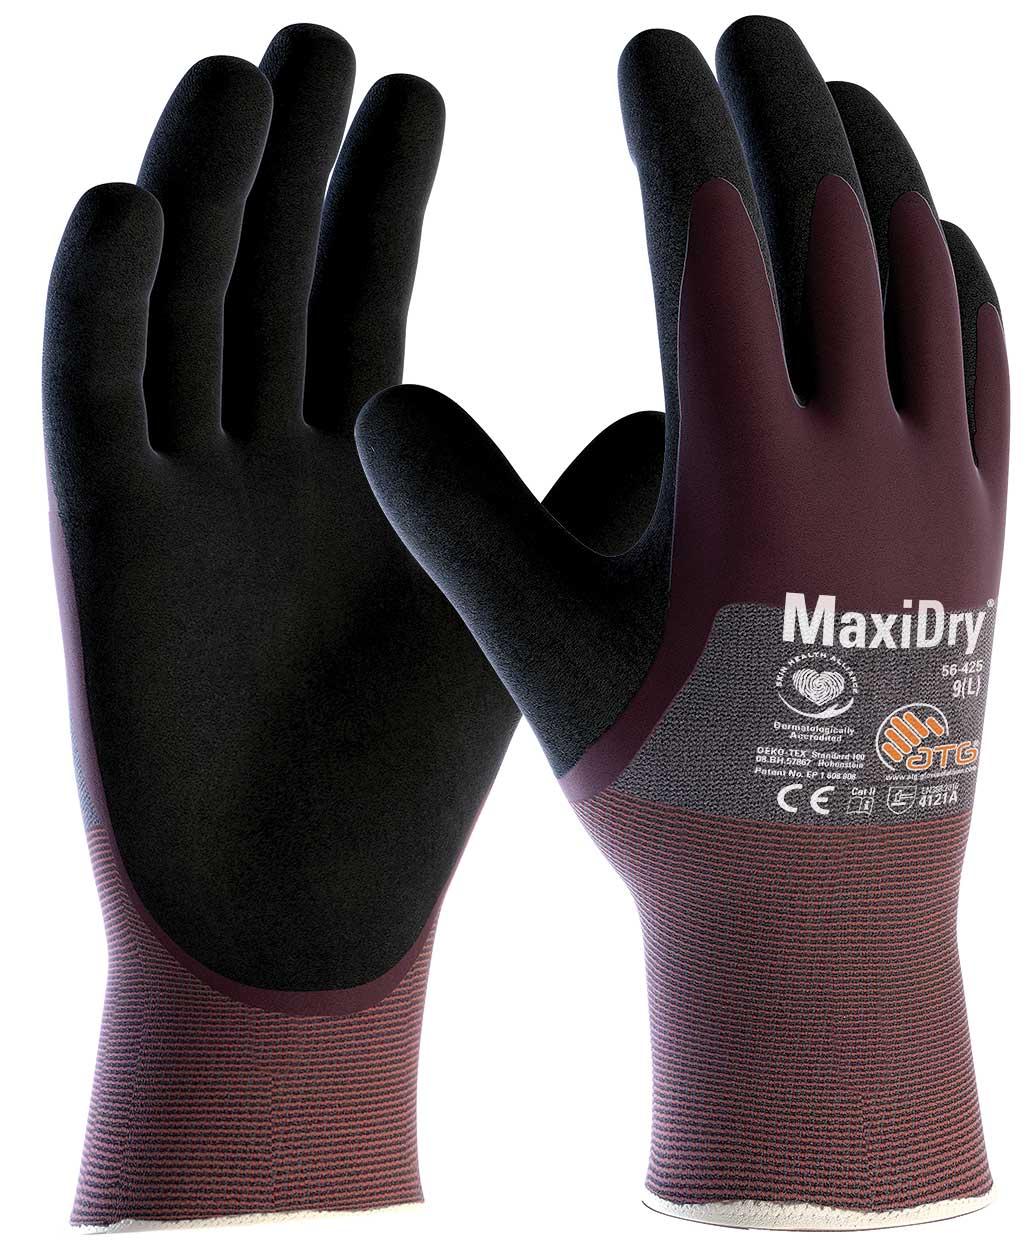 56-425 MaxiDry® Image